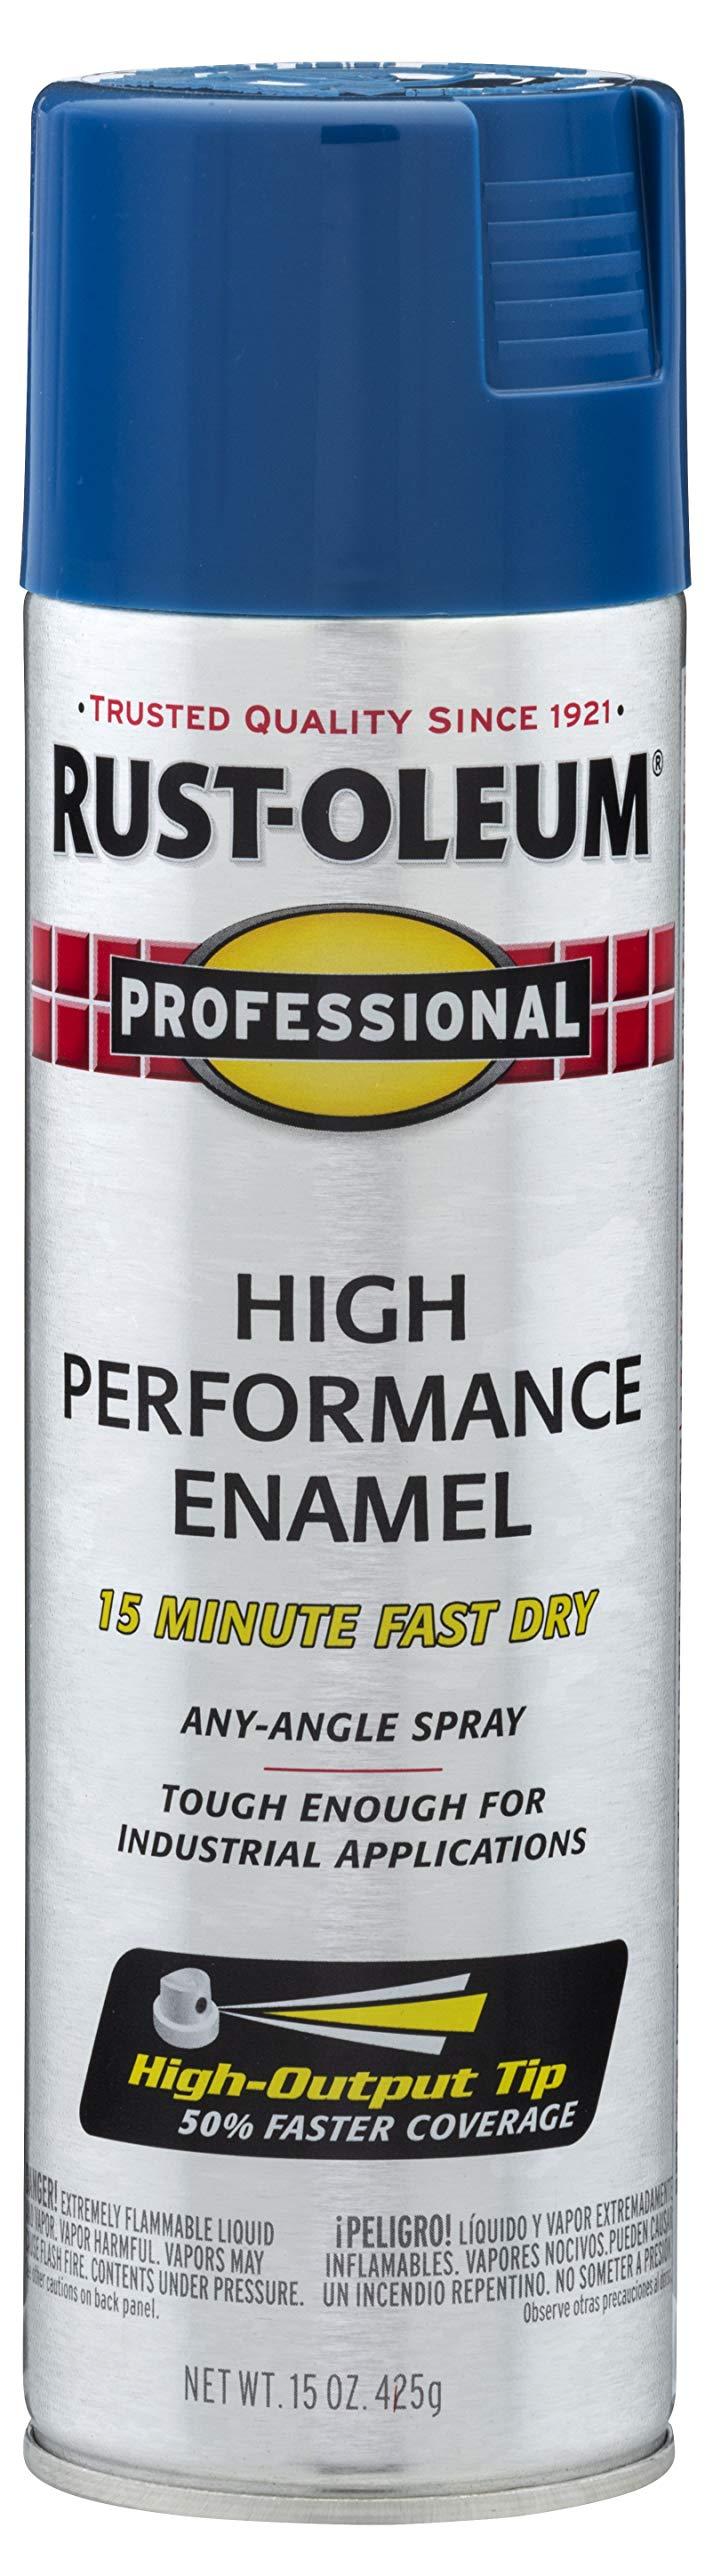 Rust-Oleum 7527838 Enamel Spray Paint, 15 Oz, Gloss Royal Blue, 15 Fl Oz